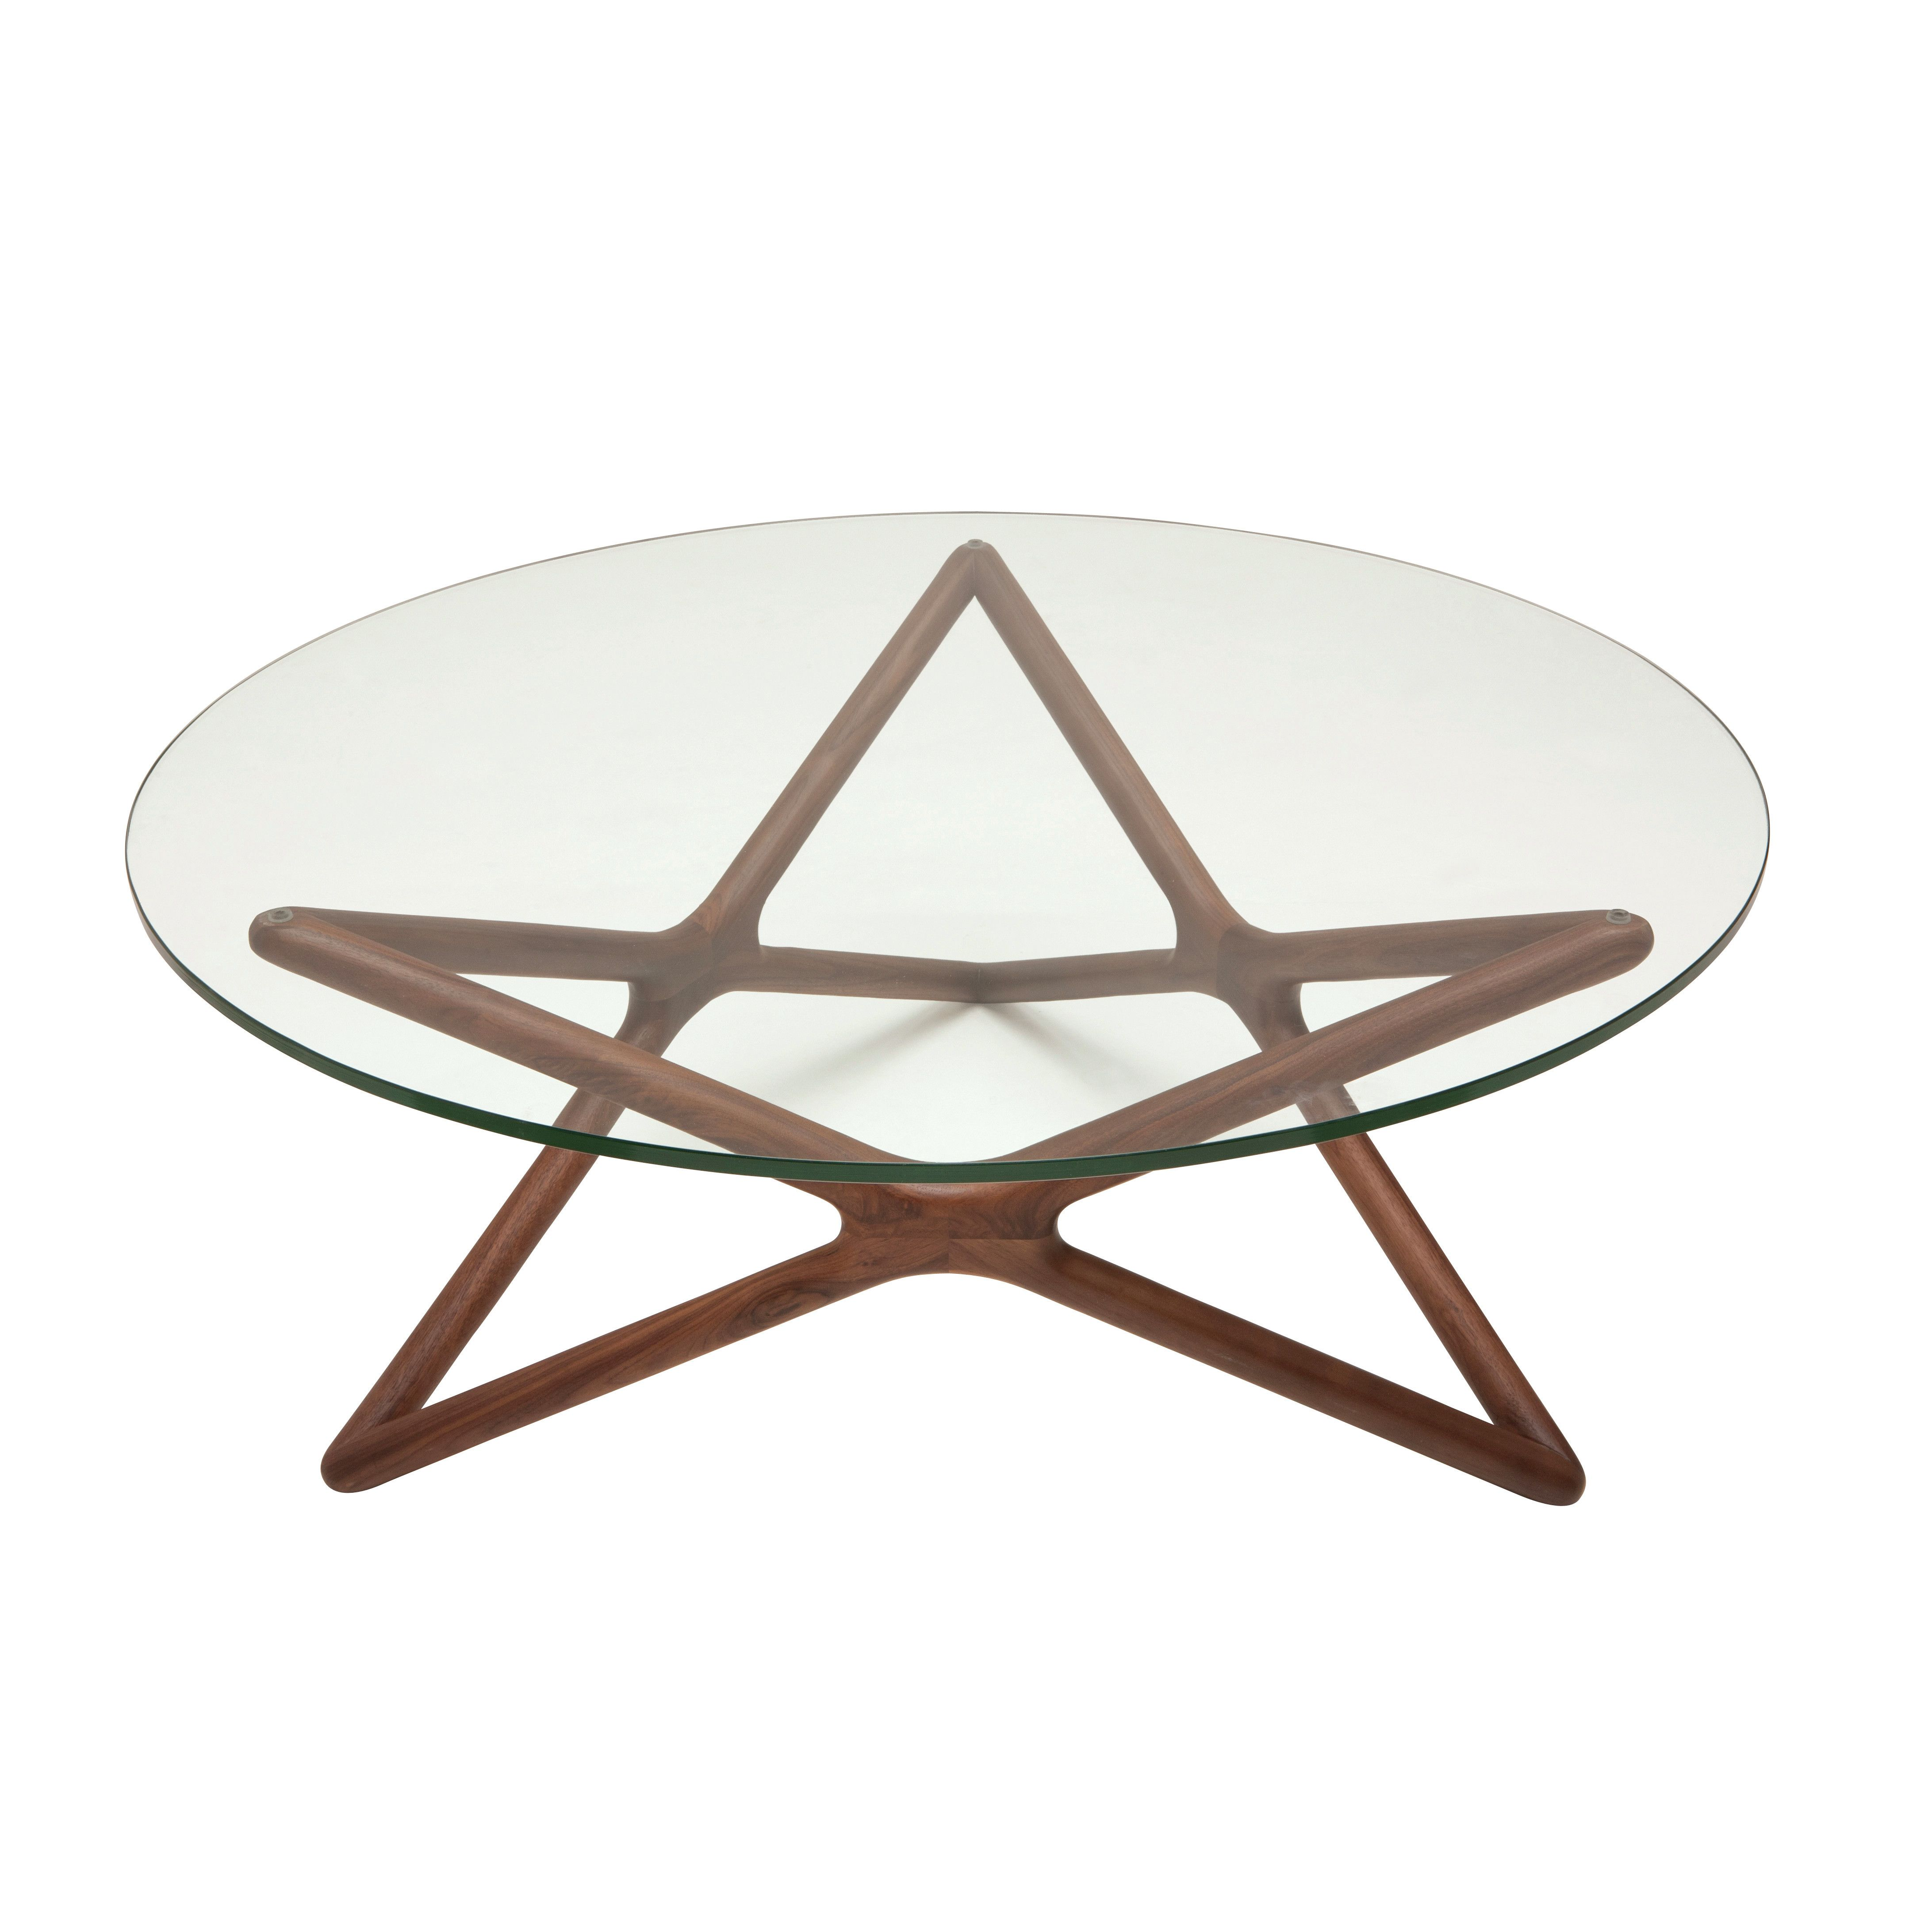 Modern wood side table  Estrella Coffee Table  INTERIORS Furniture u Decor  Pinterest